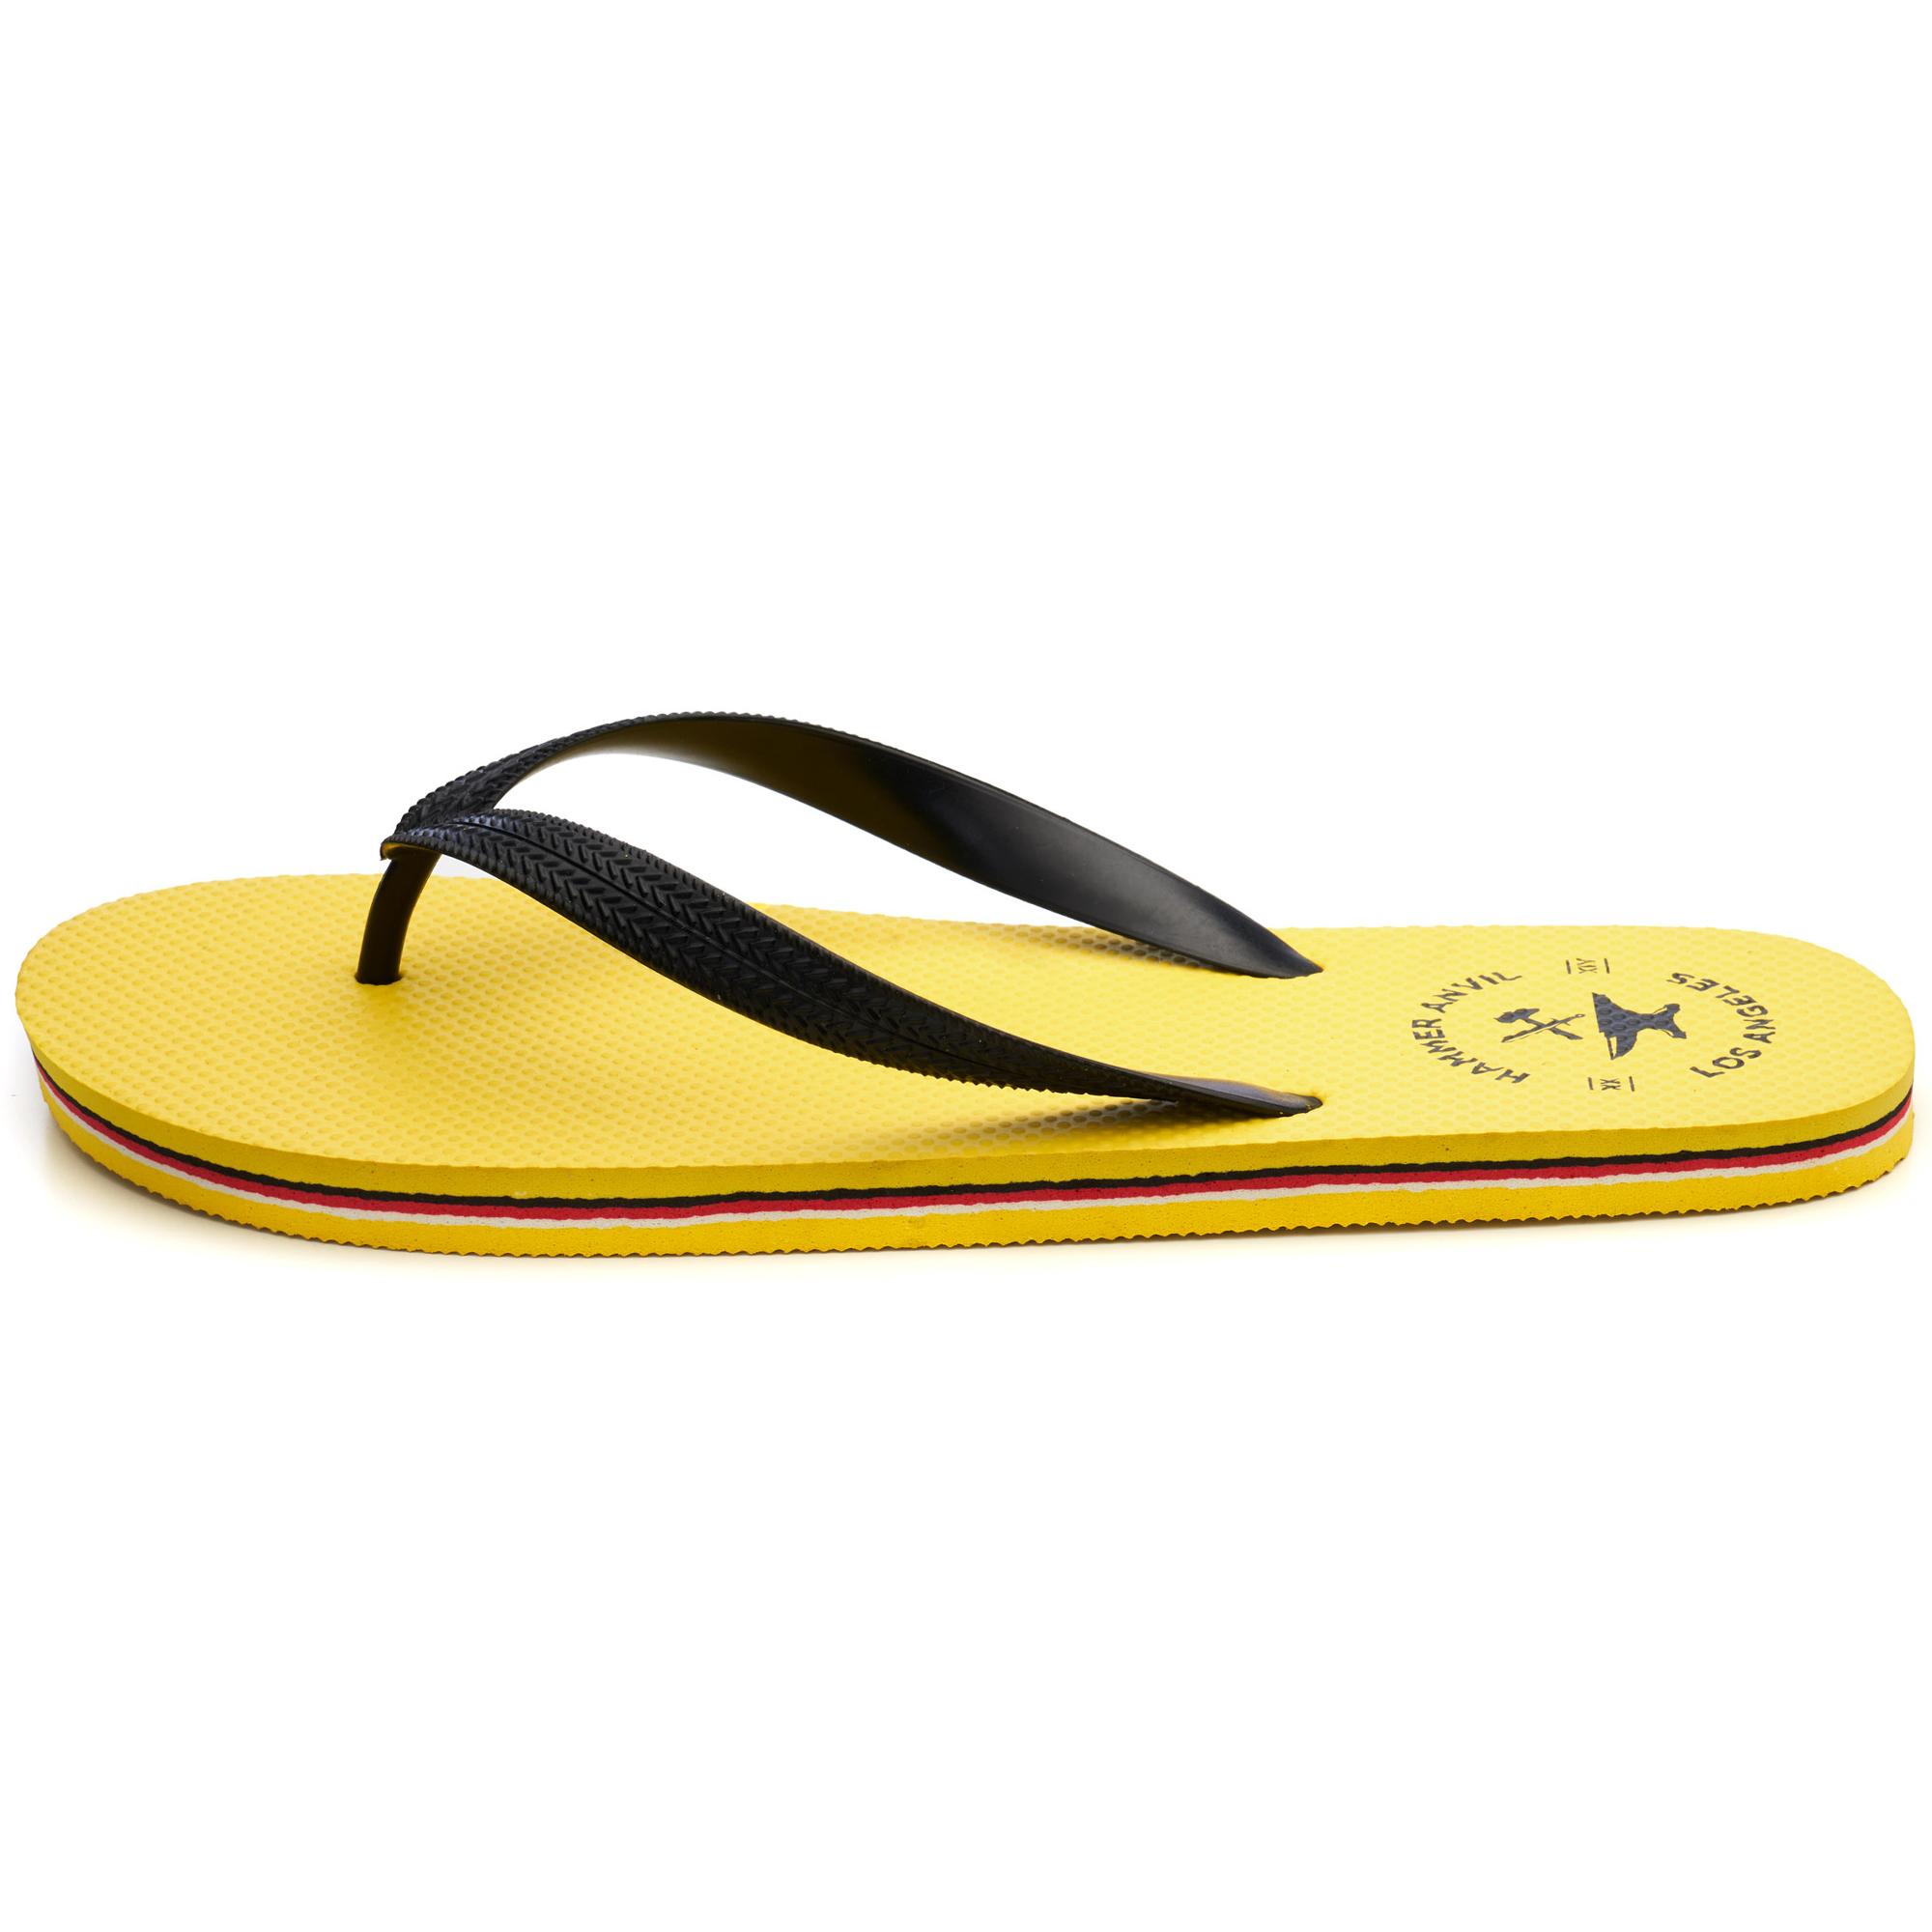 Hammer-Anvil-Mens-Flip-Flops-Casual-Thong-Summer-Sandals-Comfortable-Beach-Shoes thumbnail 47